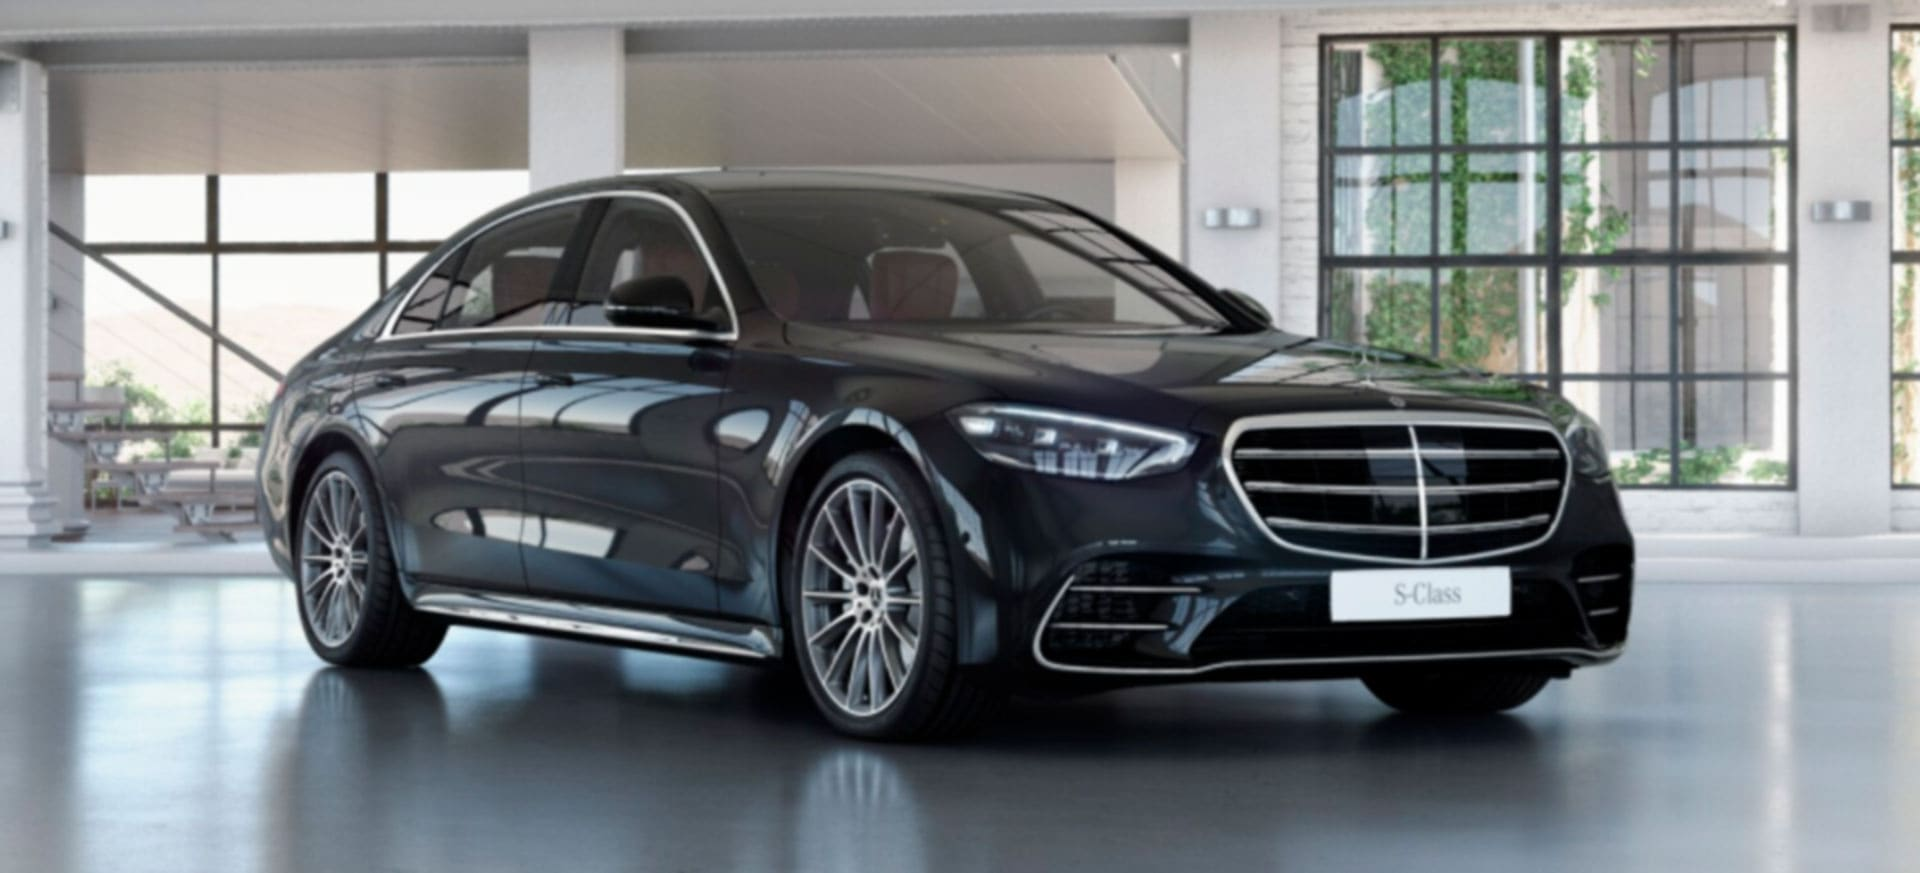 Mercedes-Benz S-Class Limousine 0052623122